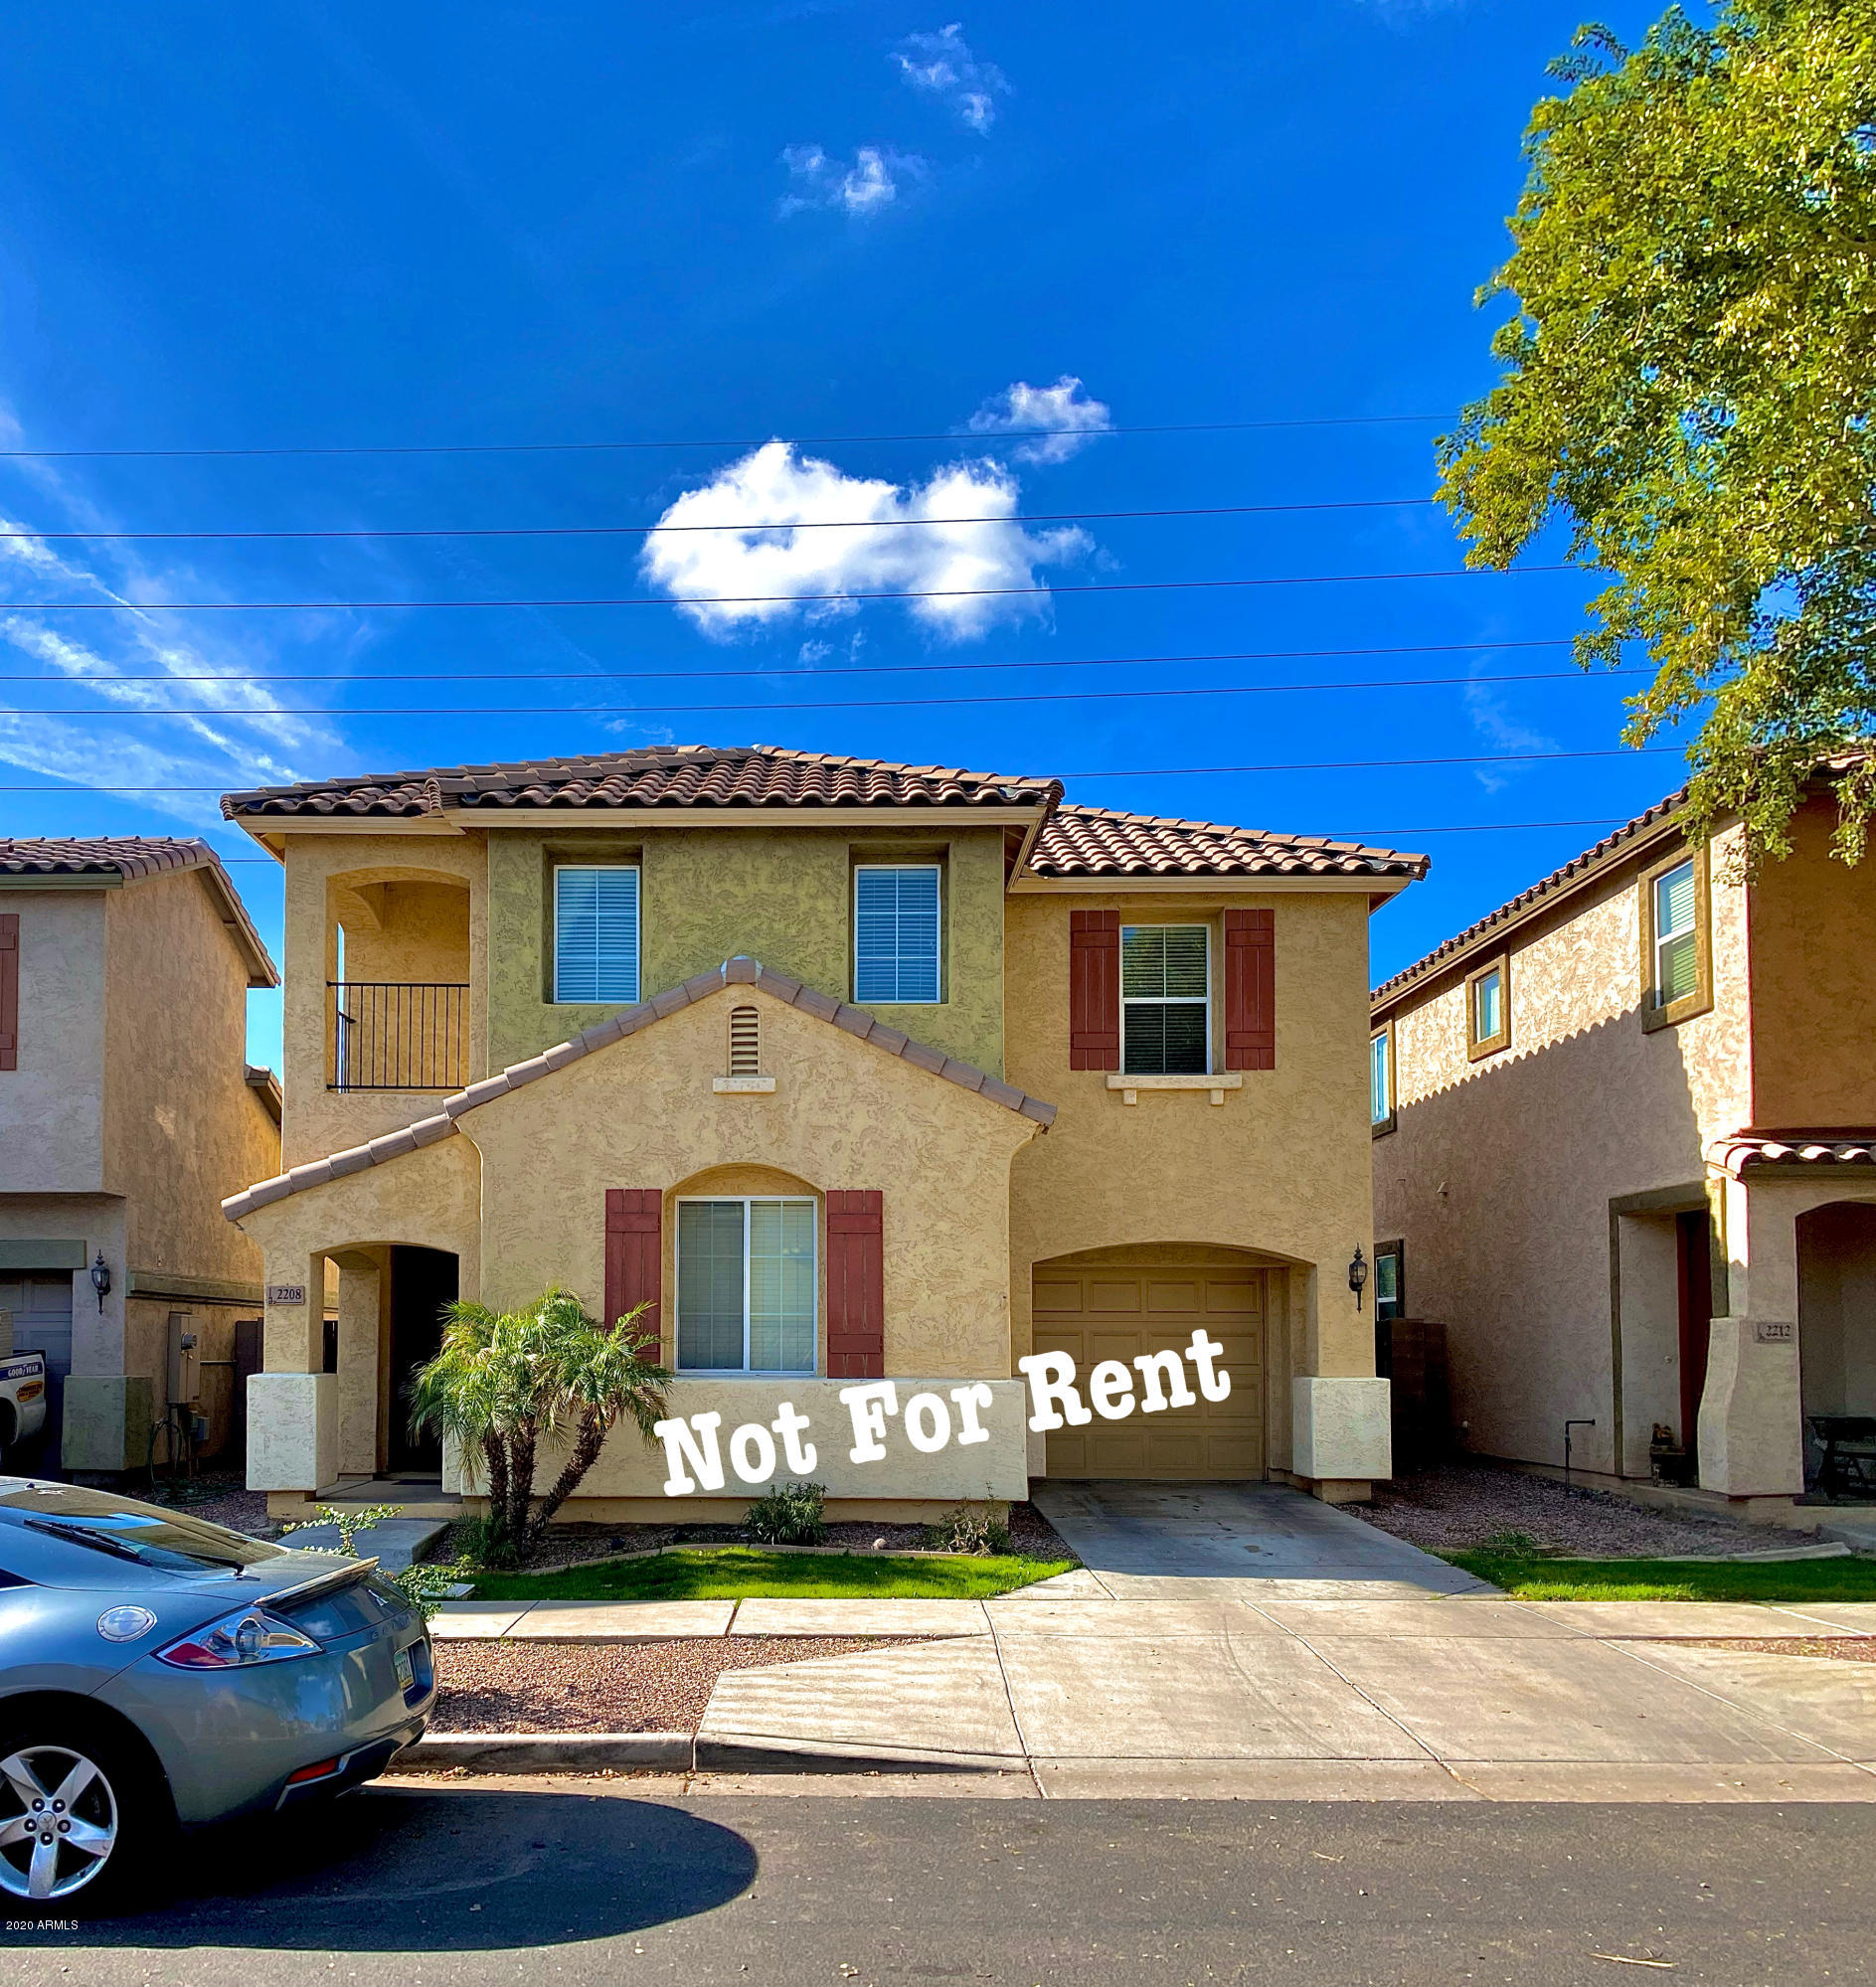 Photo of 2208 N 78TH Glen, Phoenix, AZ 85035